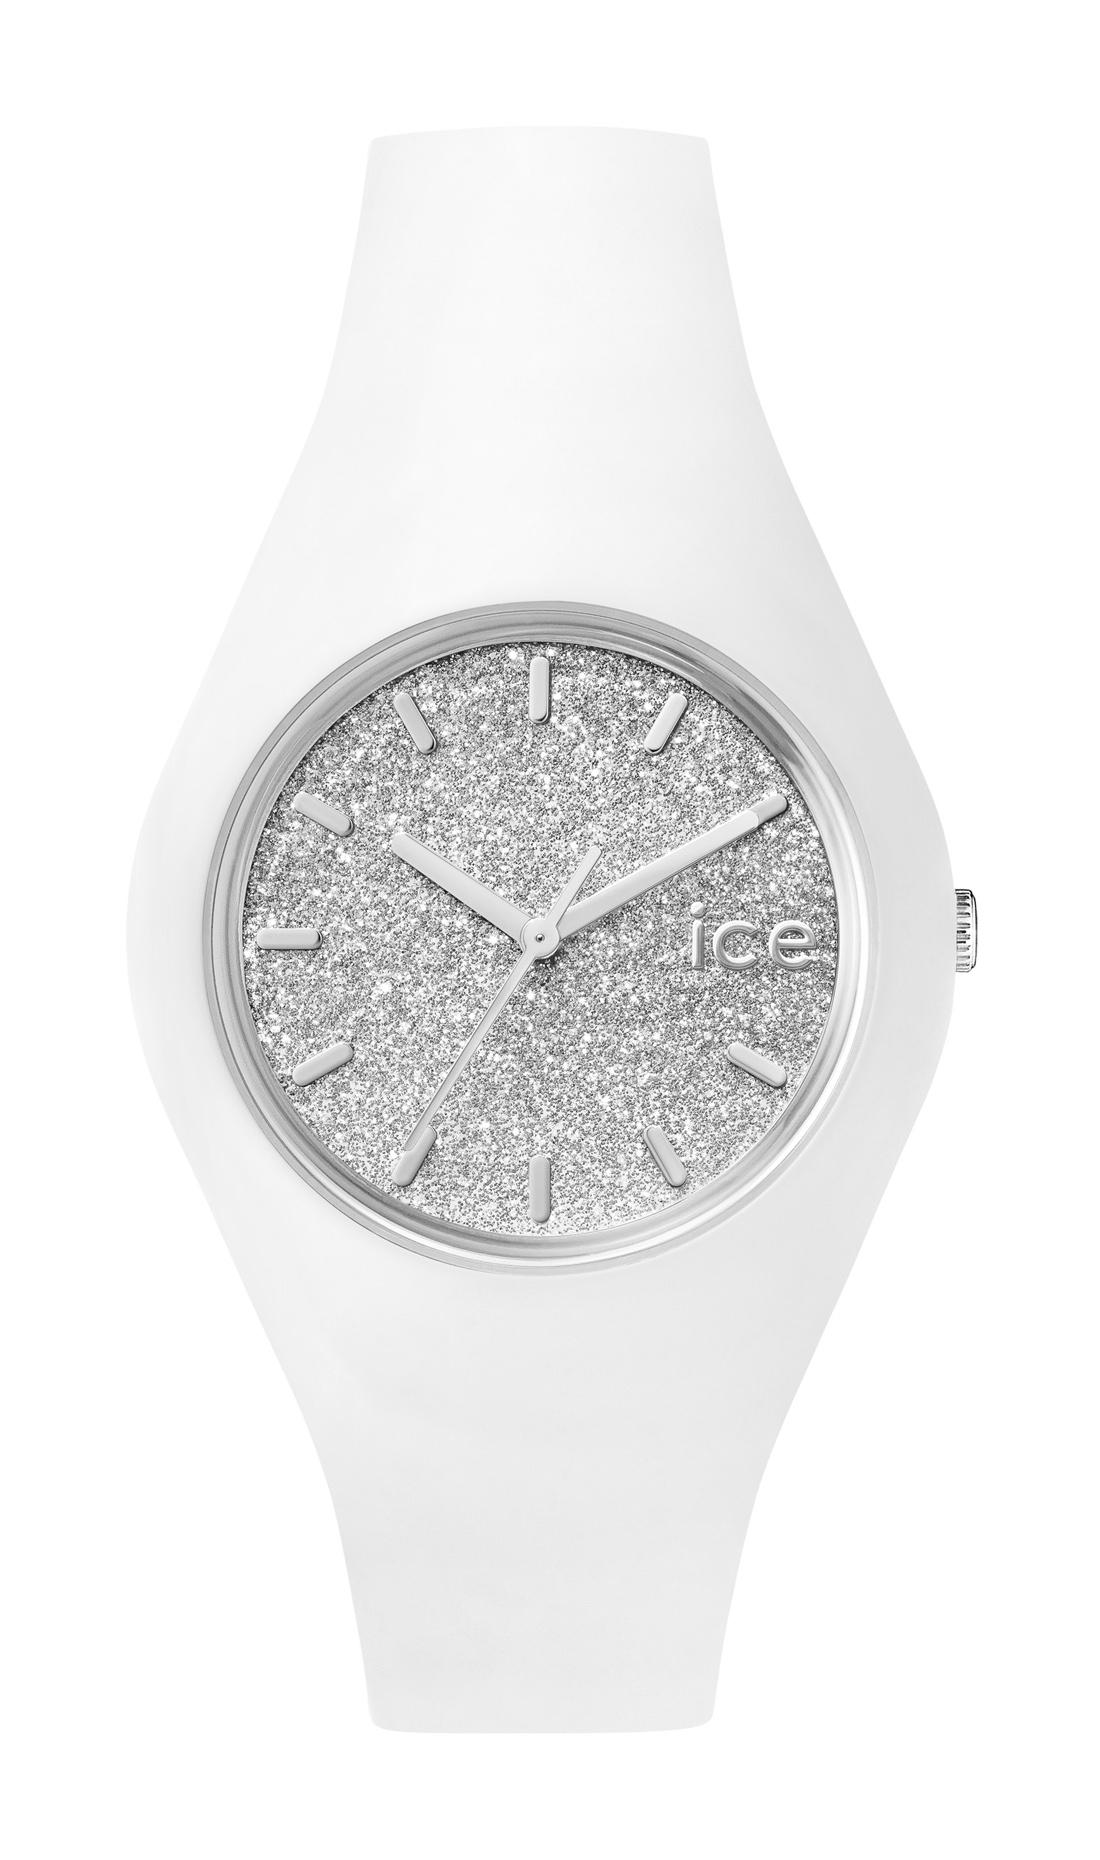 Ice-Watch_ICE Glitter_White-Silver_99Euro